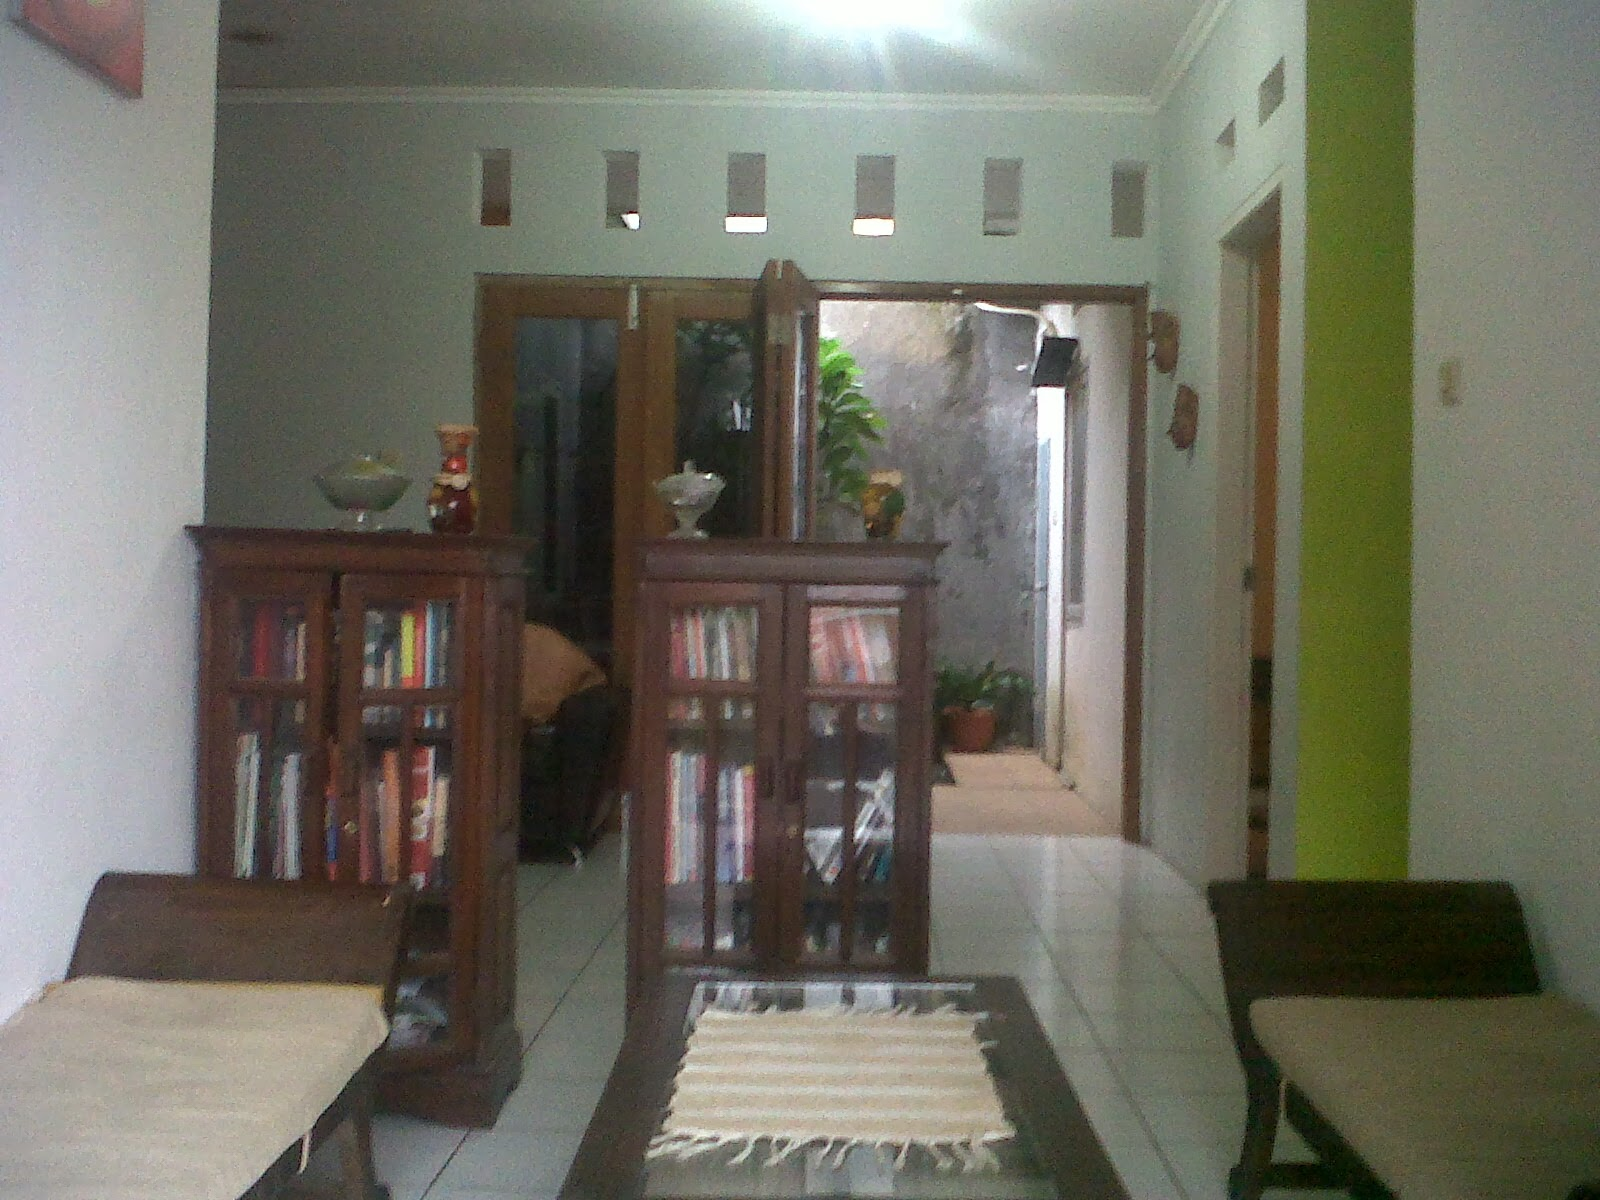 Ruang Dapur Yang Lengkap Dengan Kulkas Kompor Meja Makan Kicthen Set Perabotannya